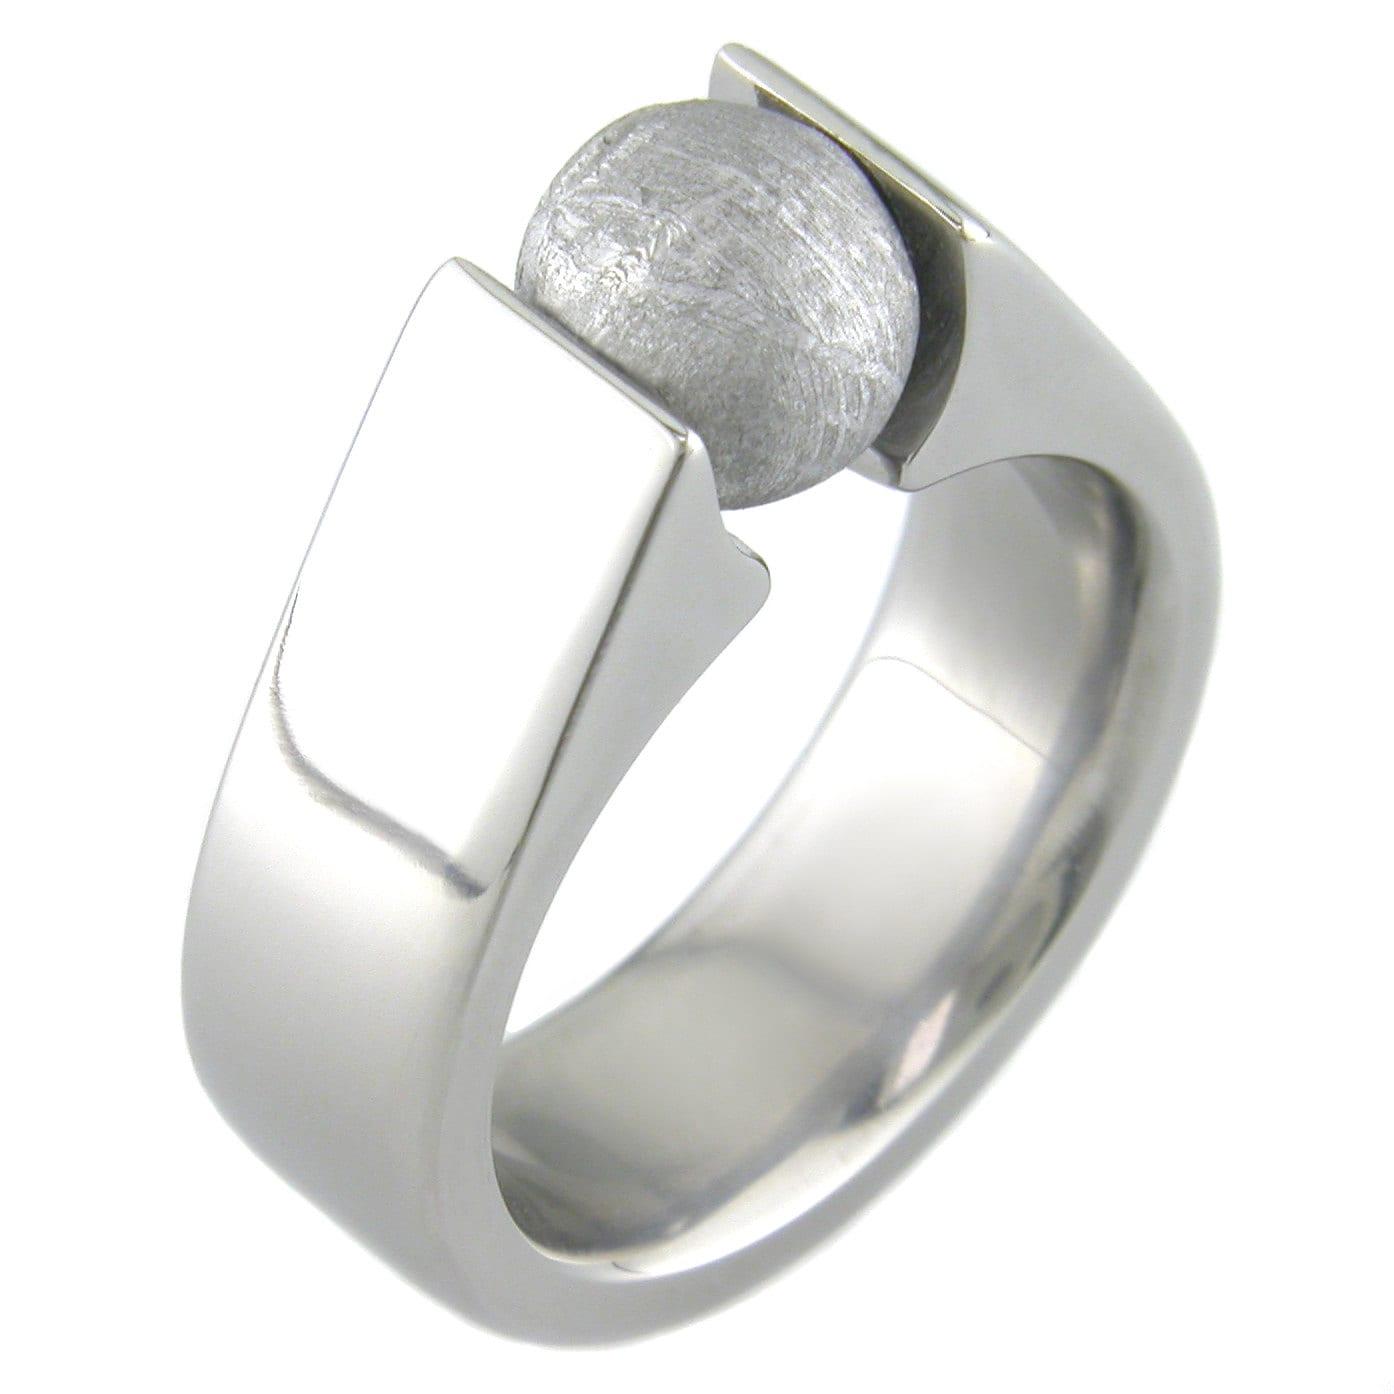 meteorite sphere titanium ring - Meteorite Wedding Ring